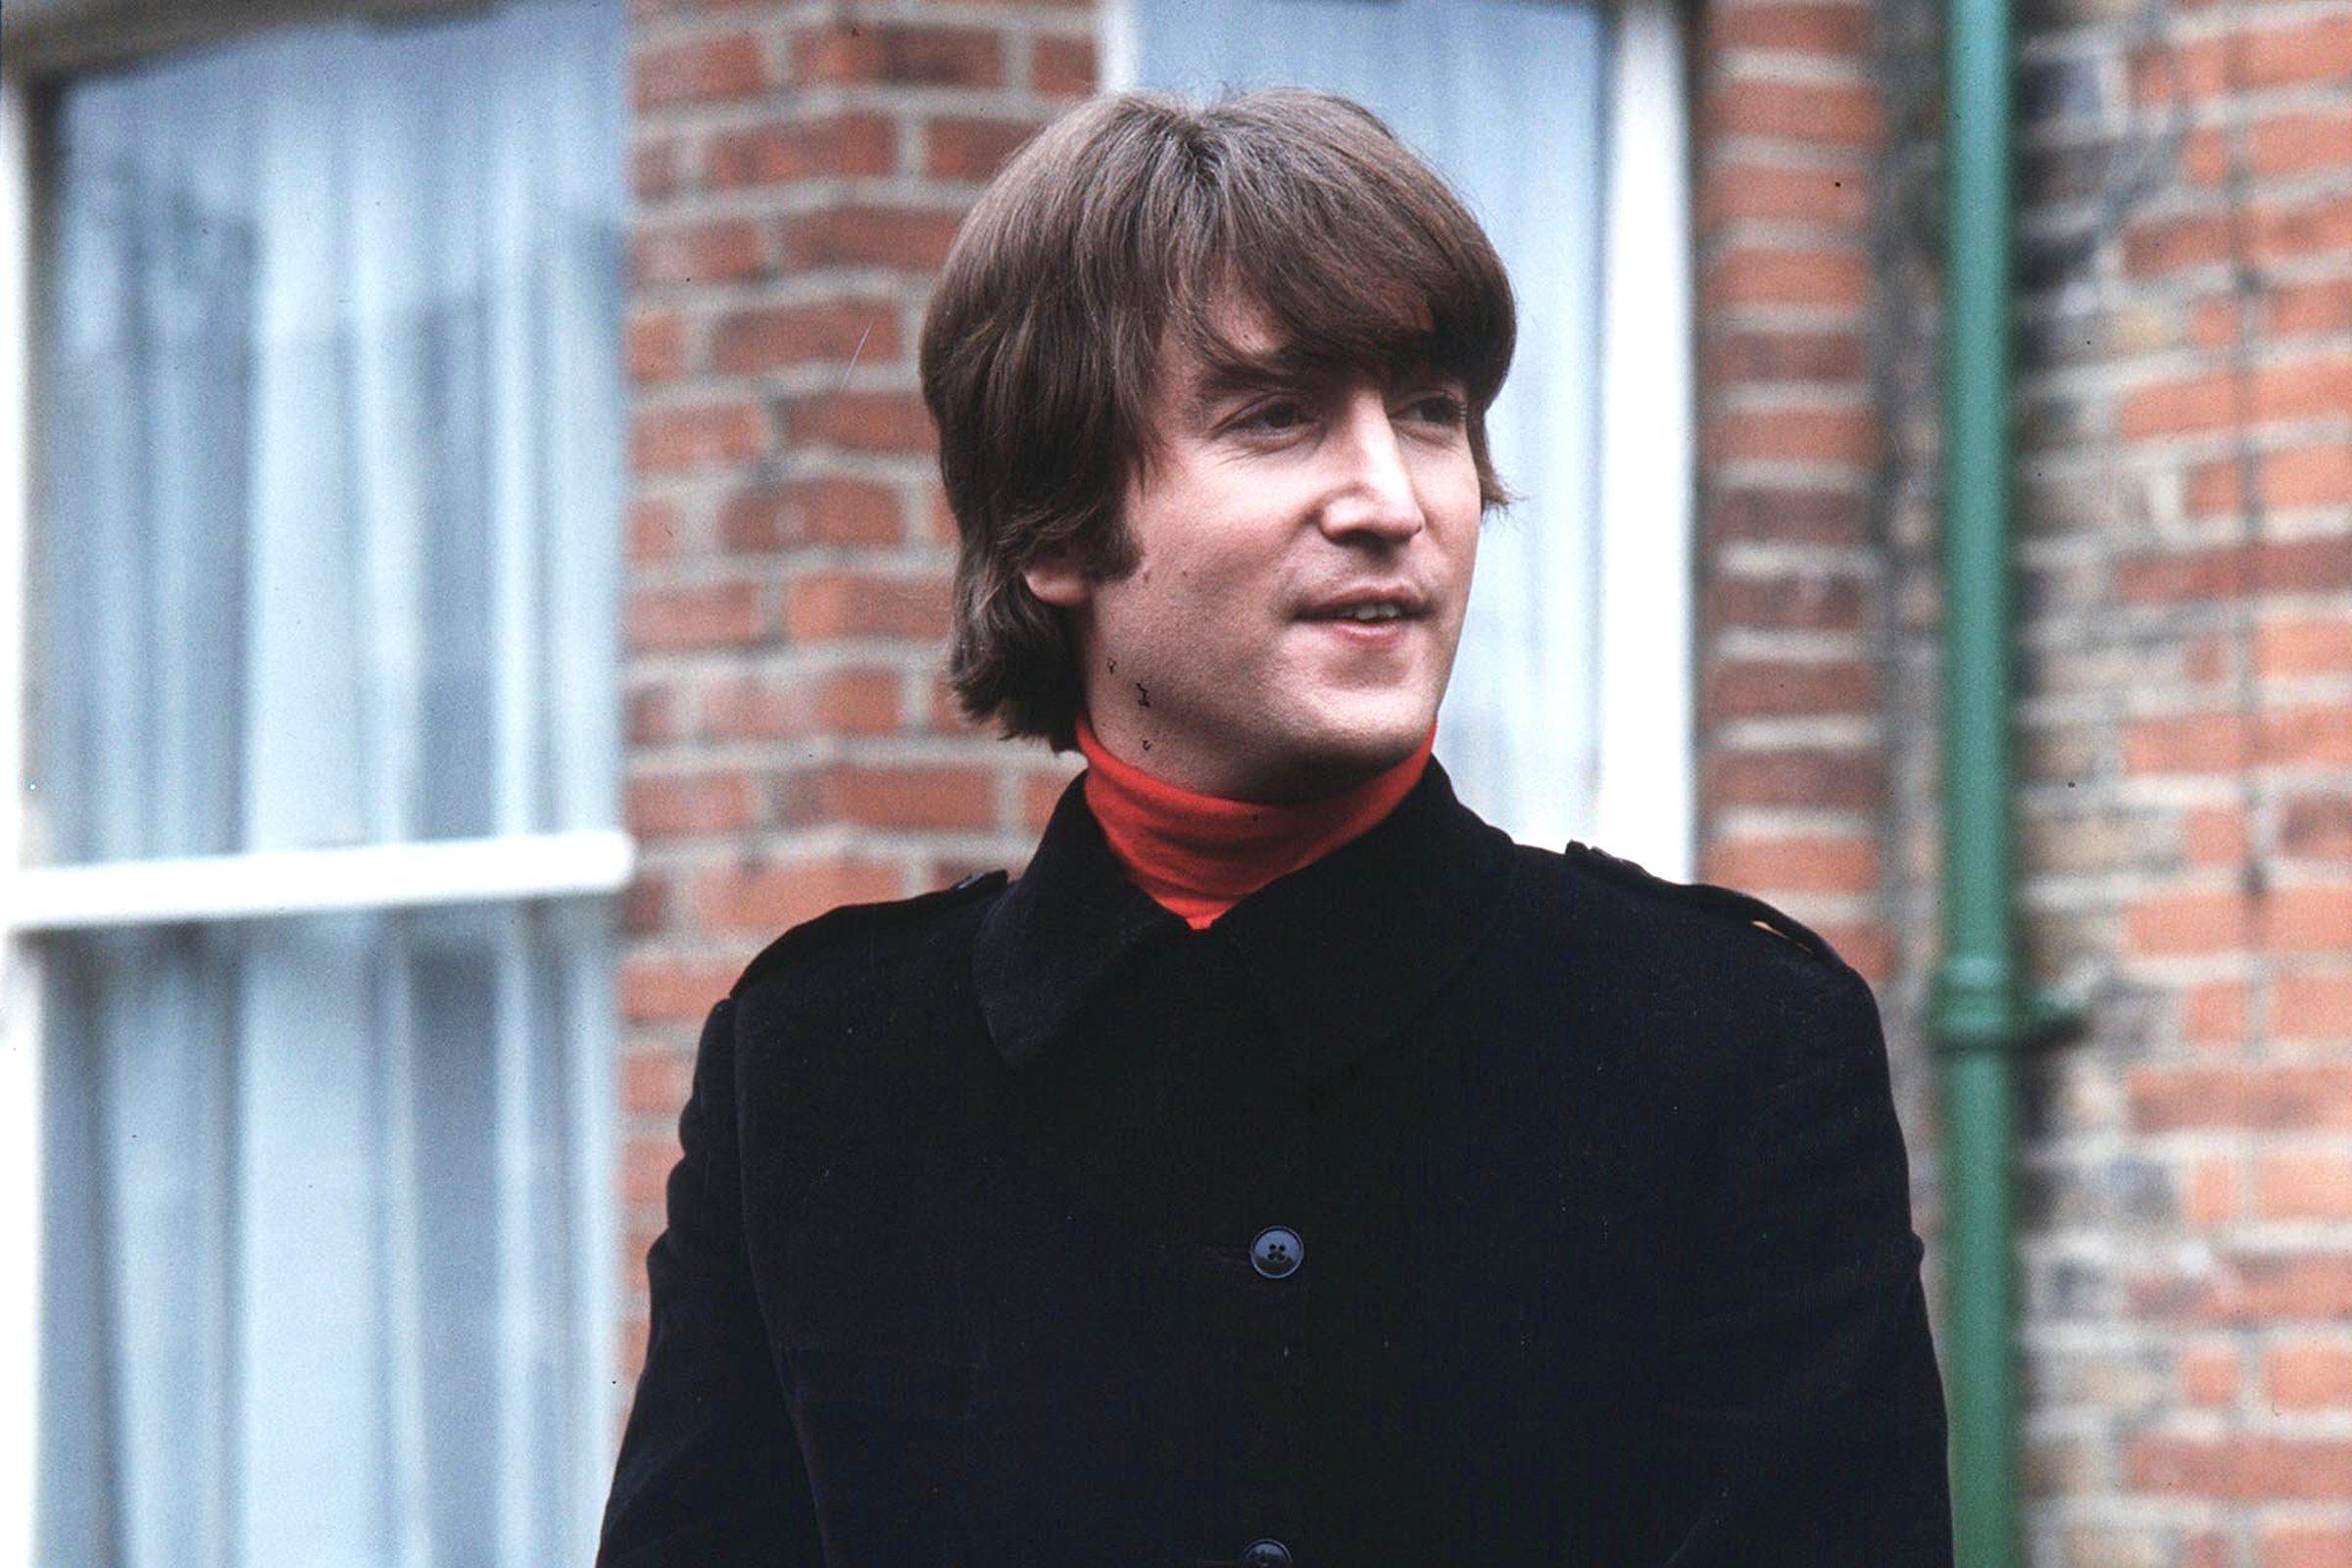 Mandatory Credit: Photo by Pierluigi Praturlon/Shutterstock (11453b) John Lennon in Ailsa Avenue, Twickenham The Beatles Filming 'Help' - 1965